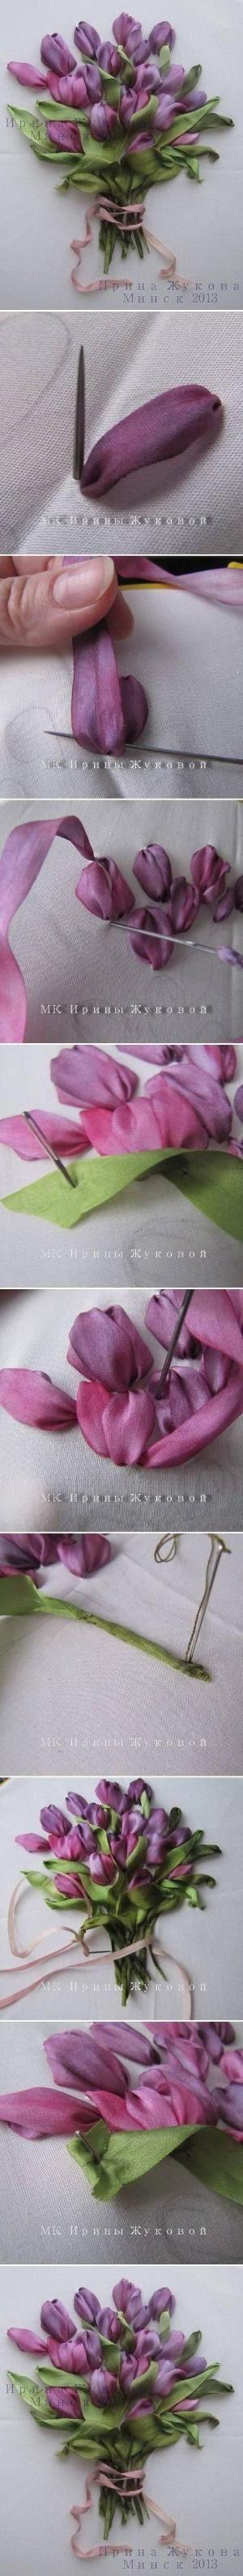 Ribbon Embroidery Search On Indulgy Pomysy Do Domu